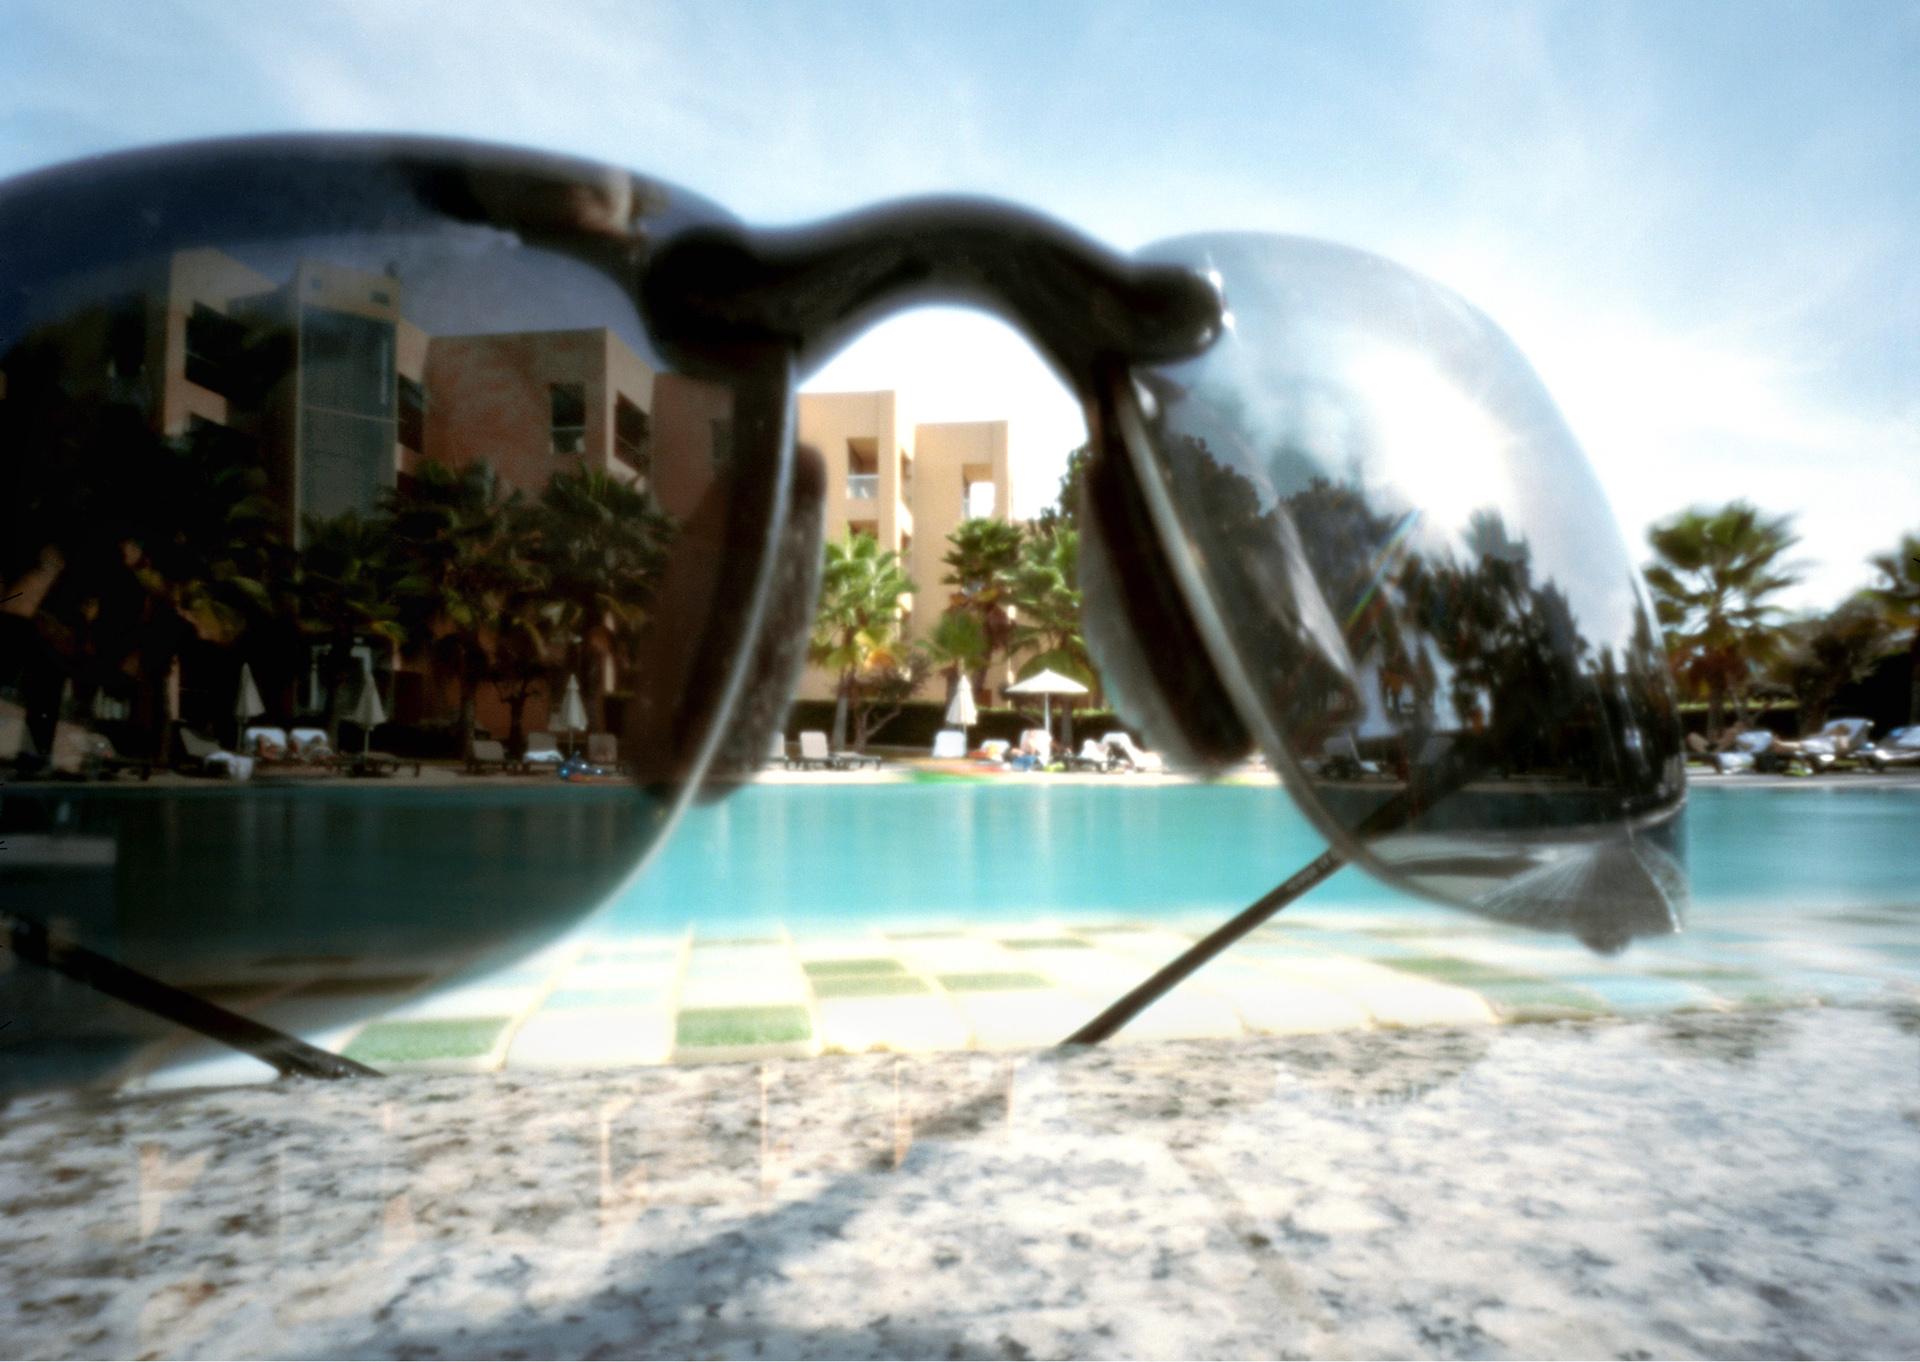 Nadege_sunglasses